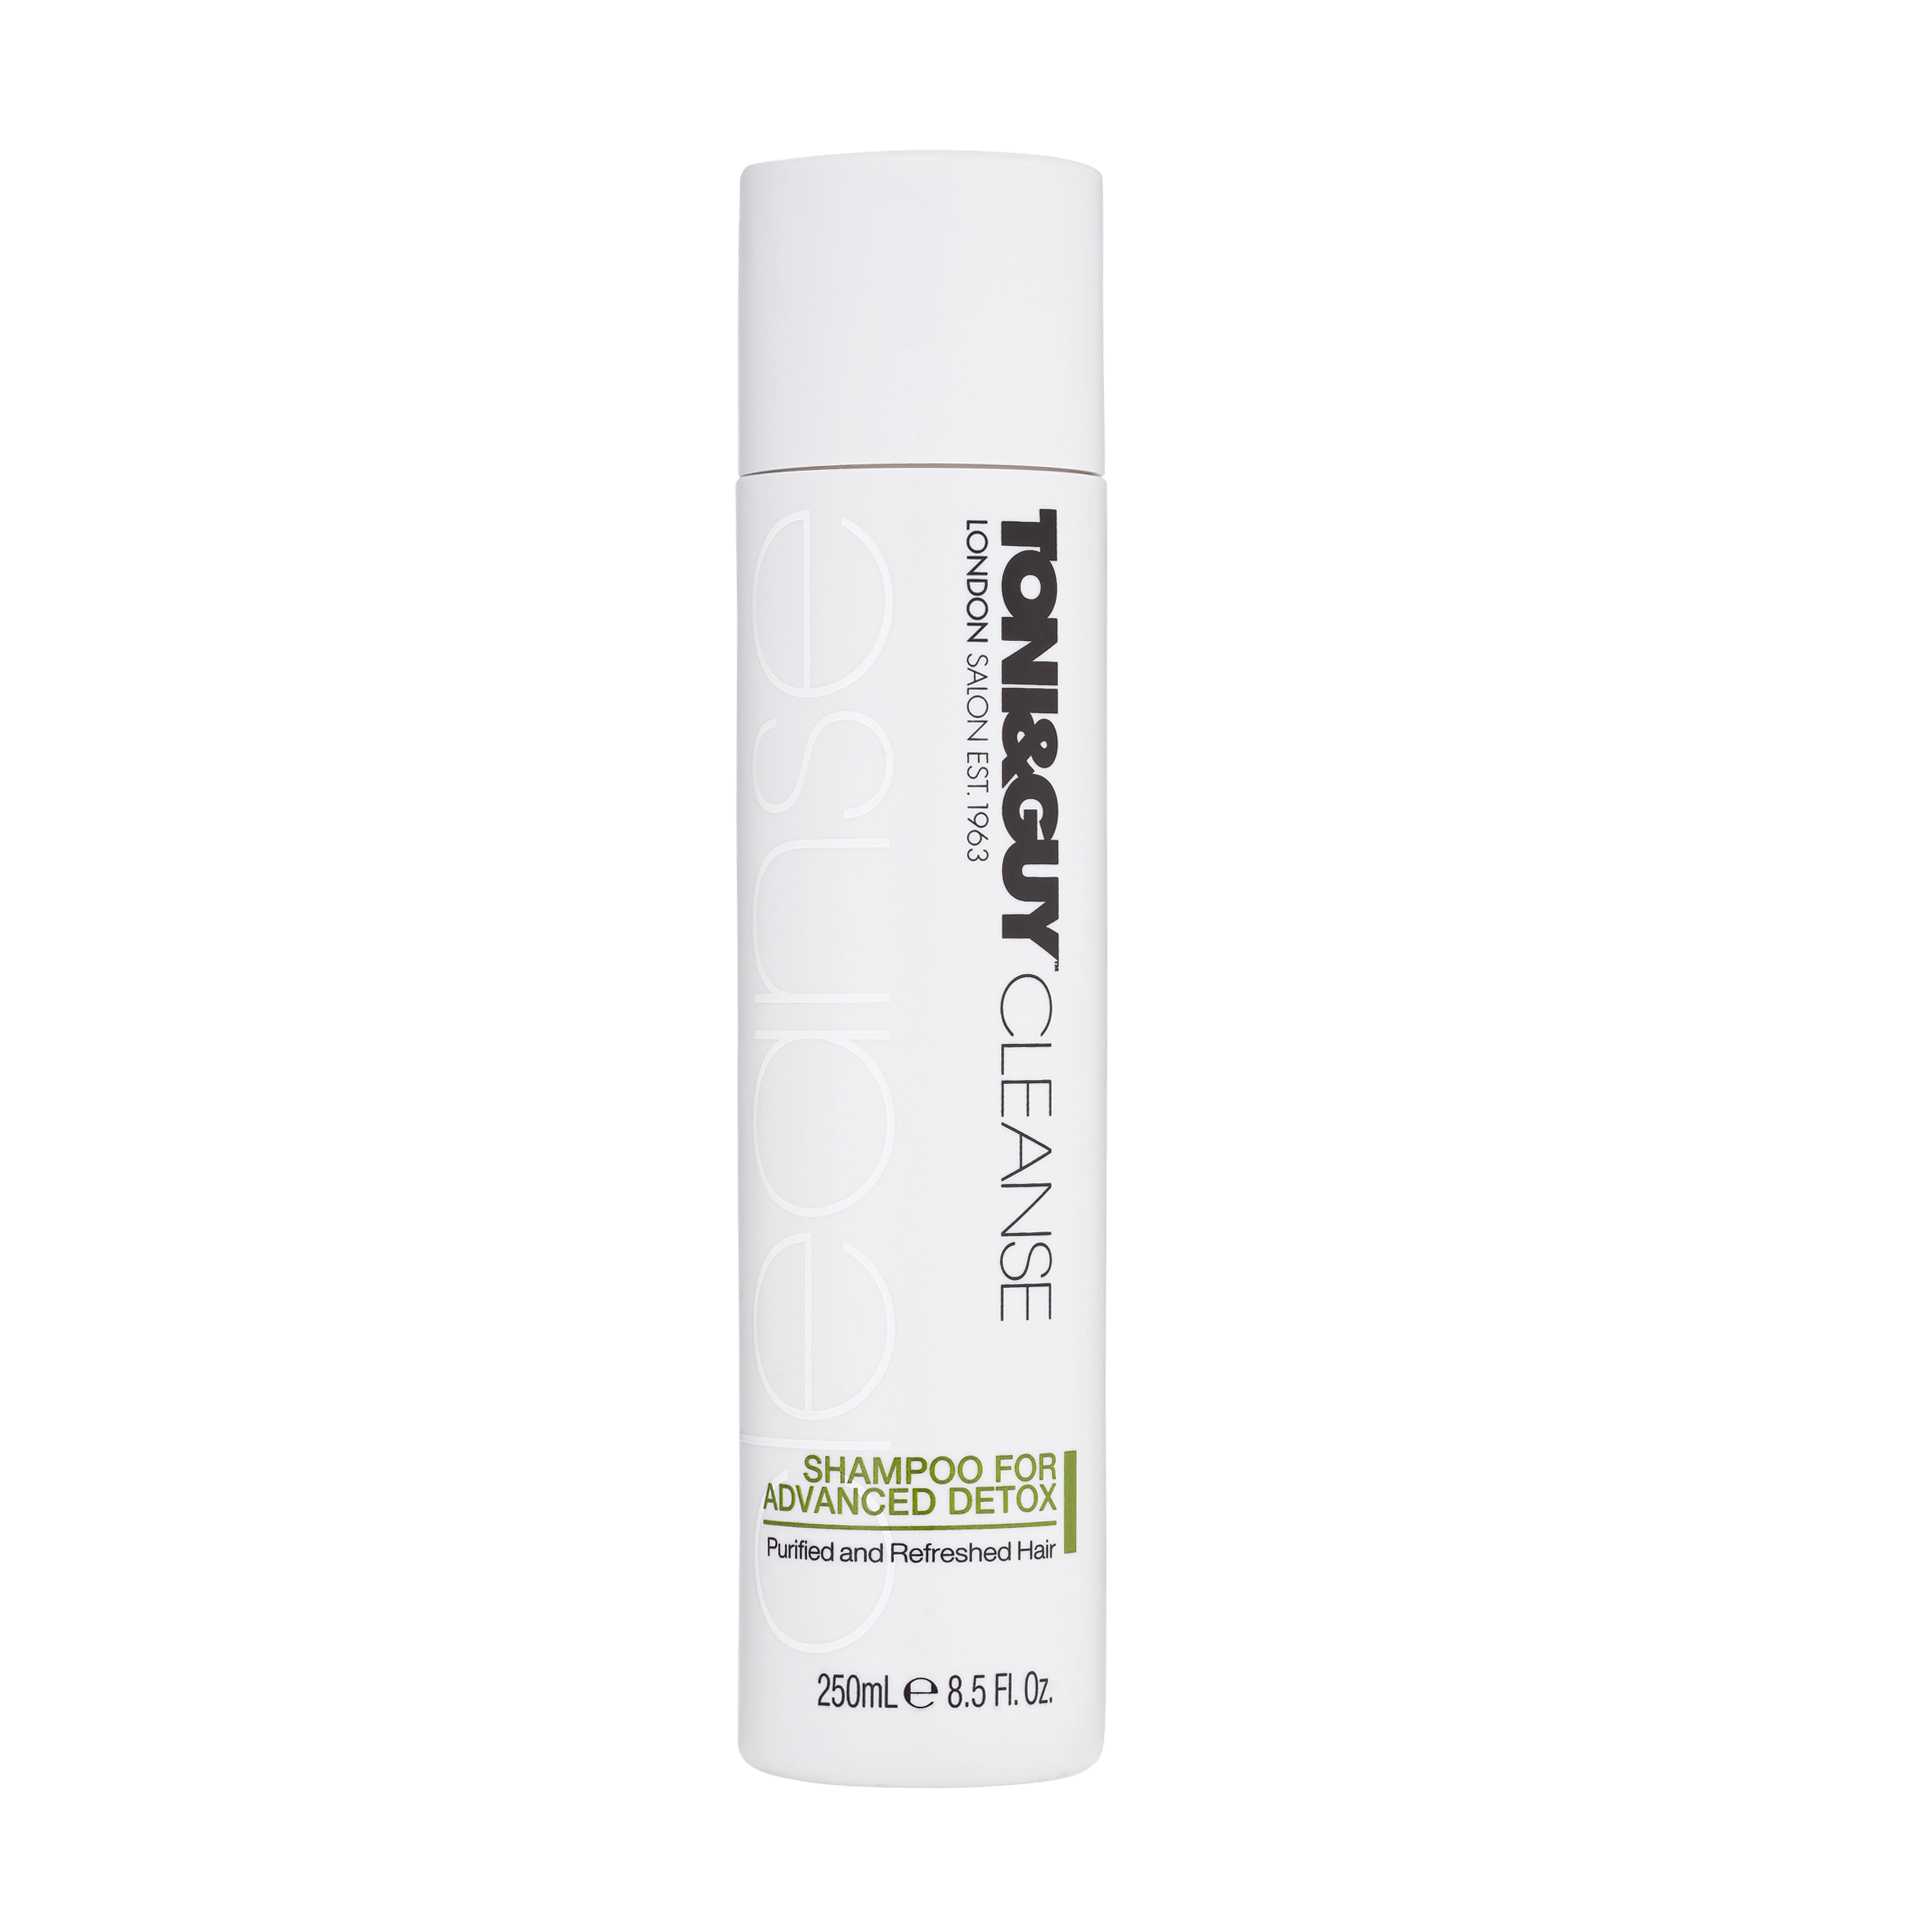 Shampoo for greasy hair: Toni&Guy Cleanse & Nourish Shampoo For Advanced Detox.